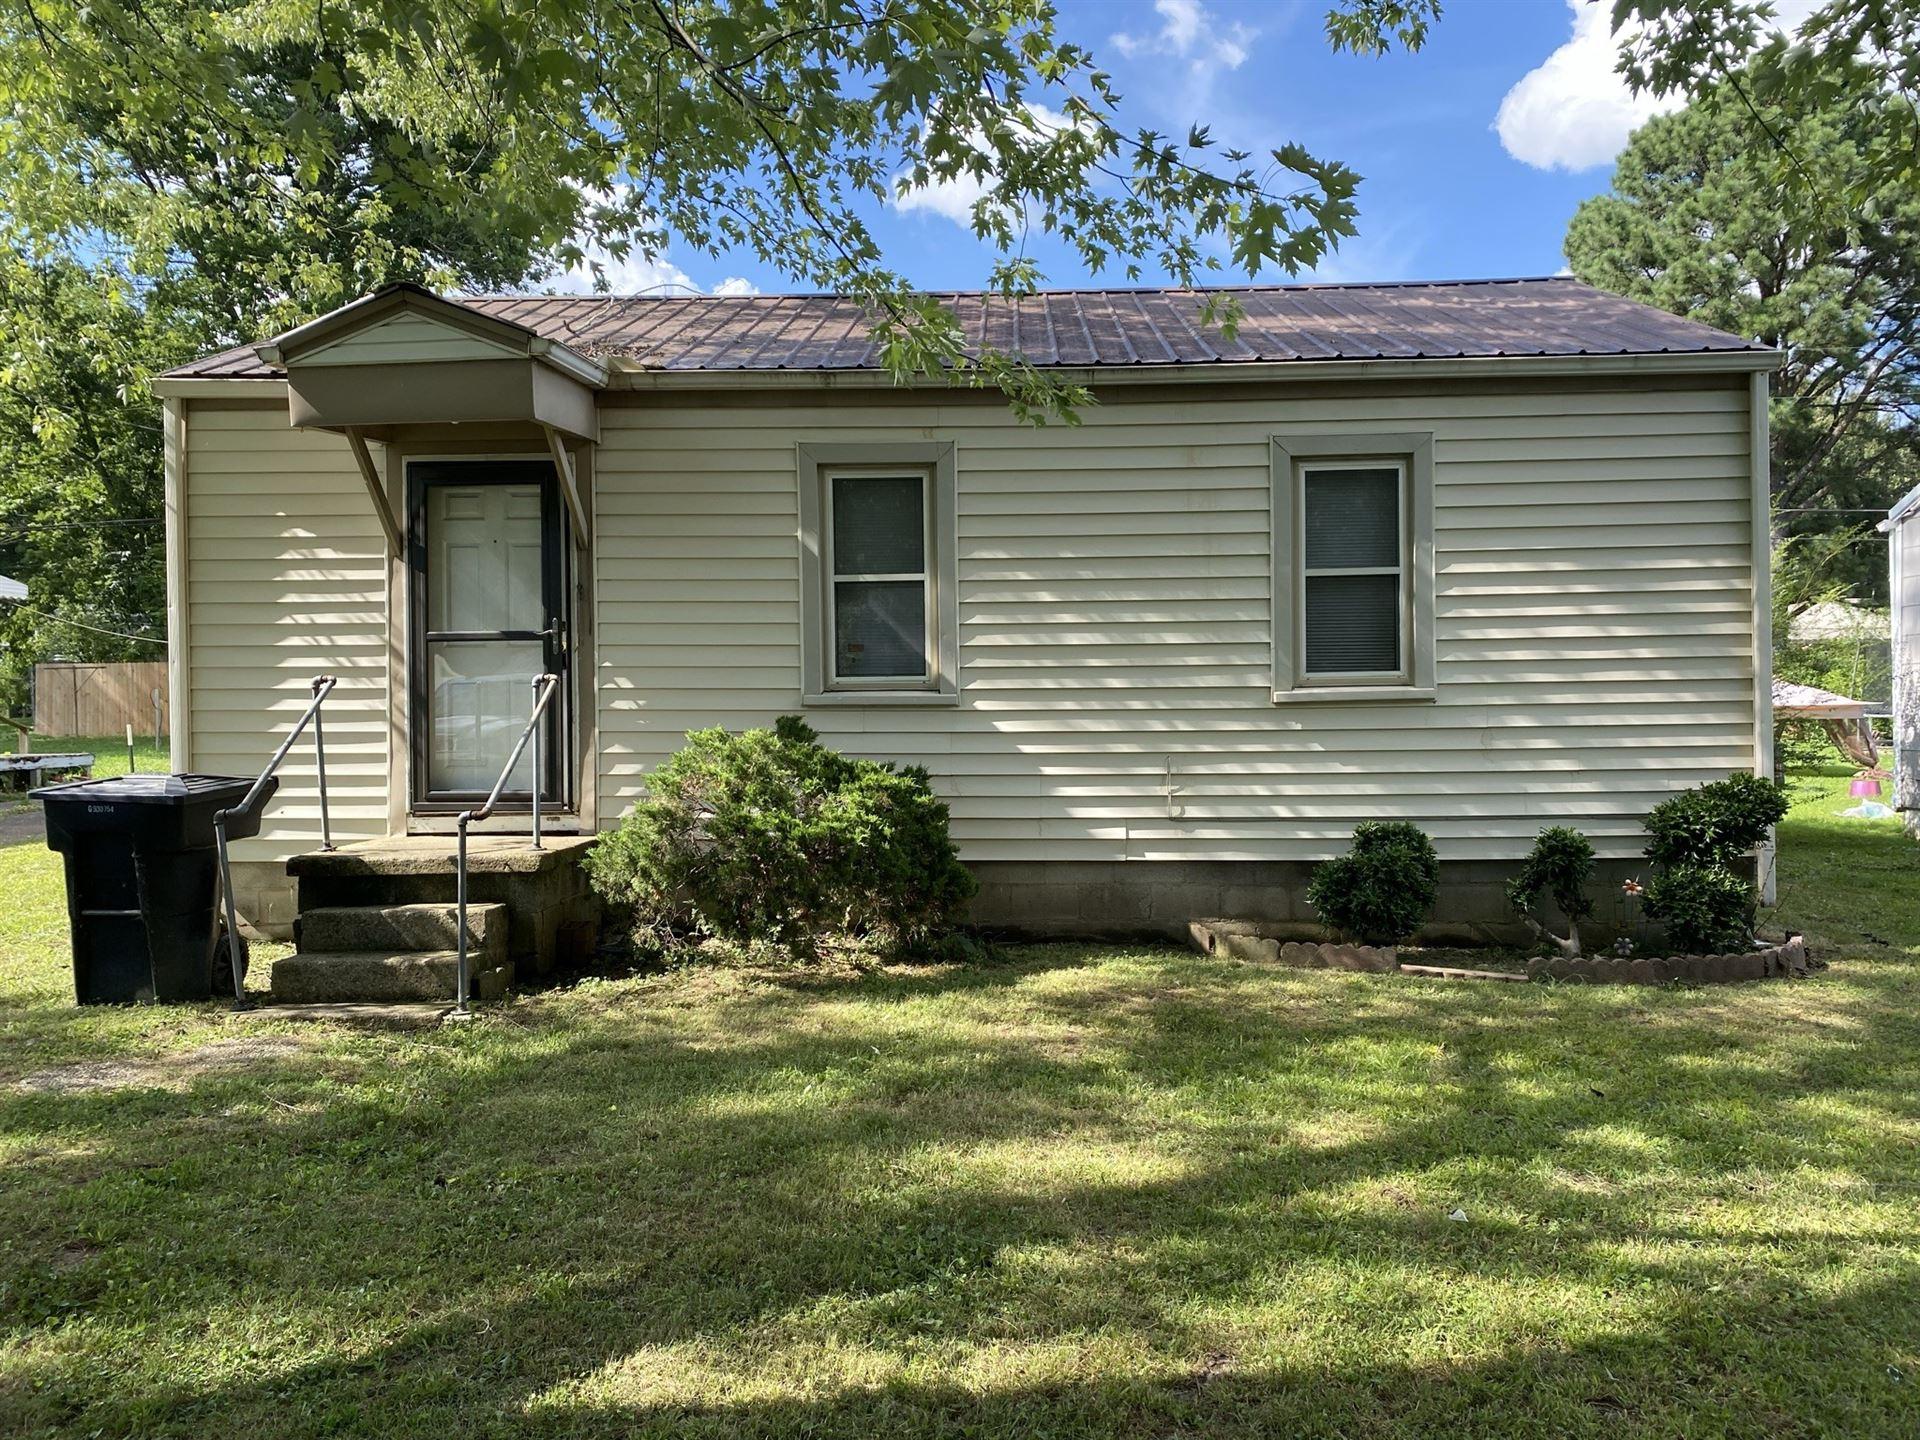 325 Oakwood Rd, Tullahoma, TN 37388 - MLS#: 2274242